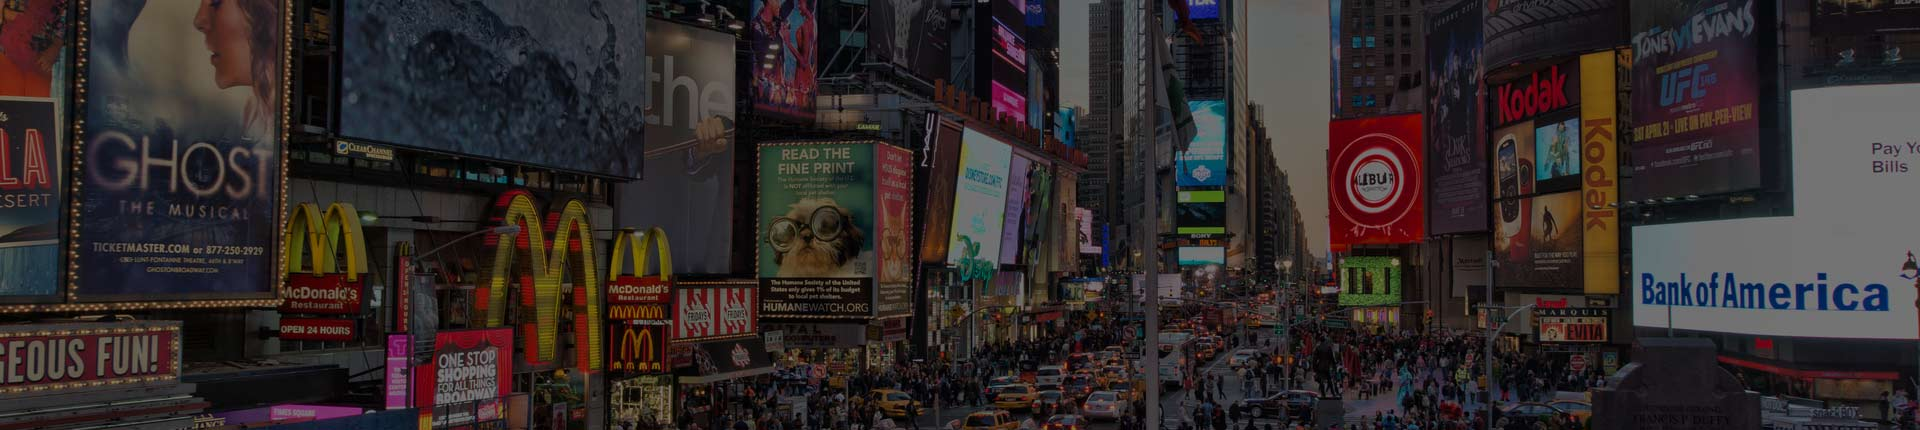 New York LED Billboard Company - Advertising